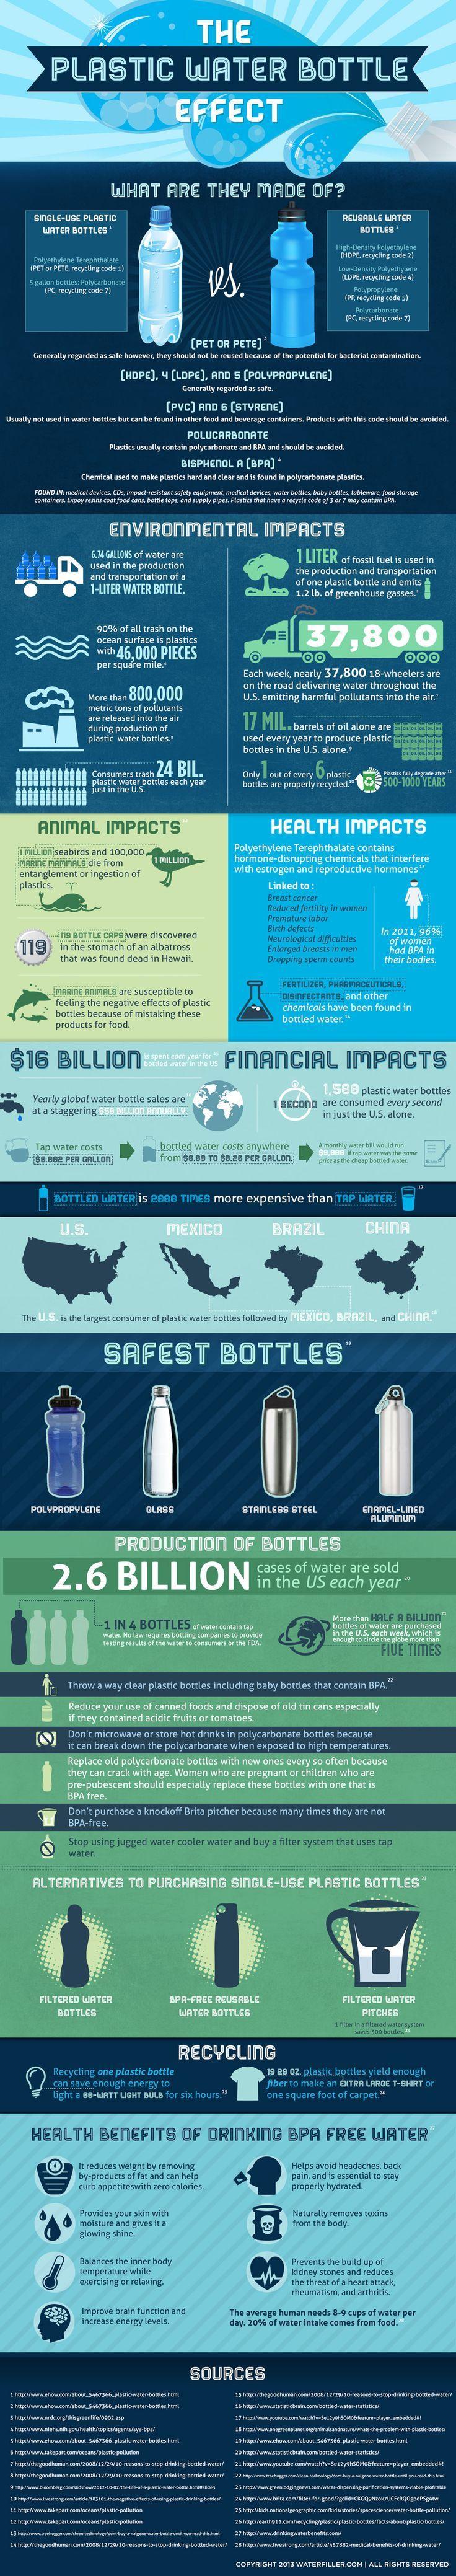 plastics plastic and water bottles App pet bottles affordable plastics - plastic bottle manufacturing, 5 gallon bottle, plastic jars, water bottle, plastic containers, water bottles and more.